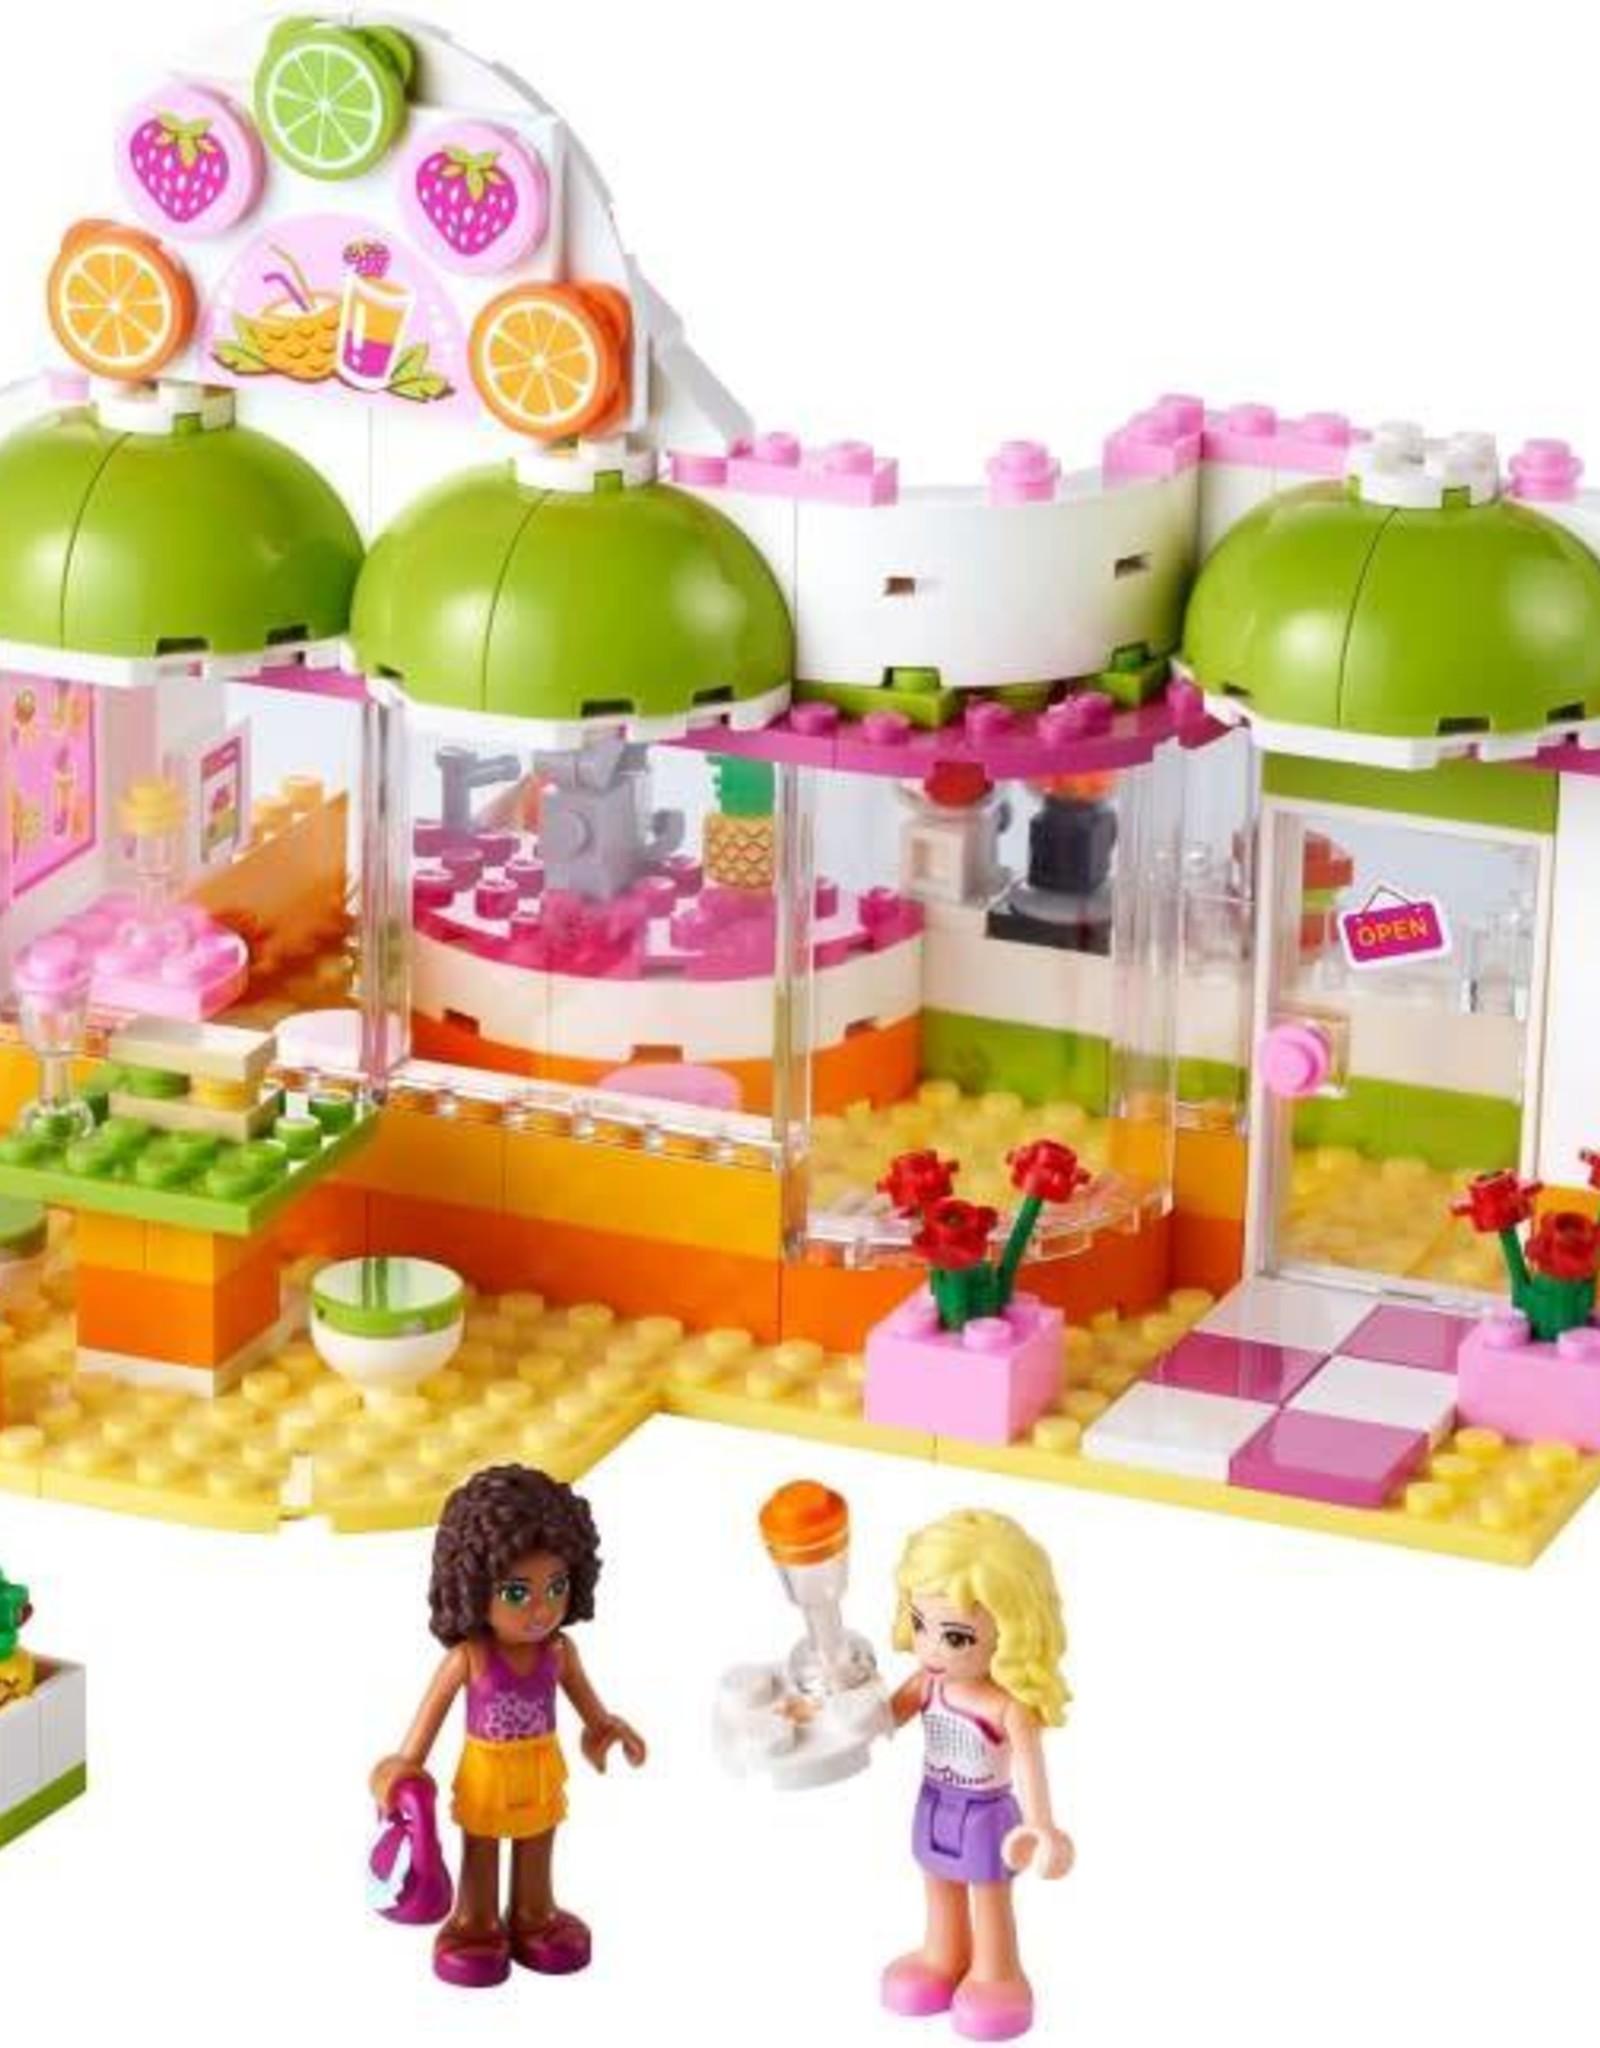 LEGO LEGO 41035 Heartlake Juice bar FRIENDS